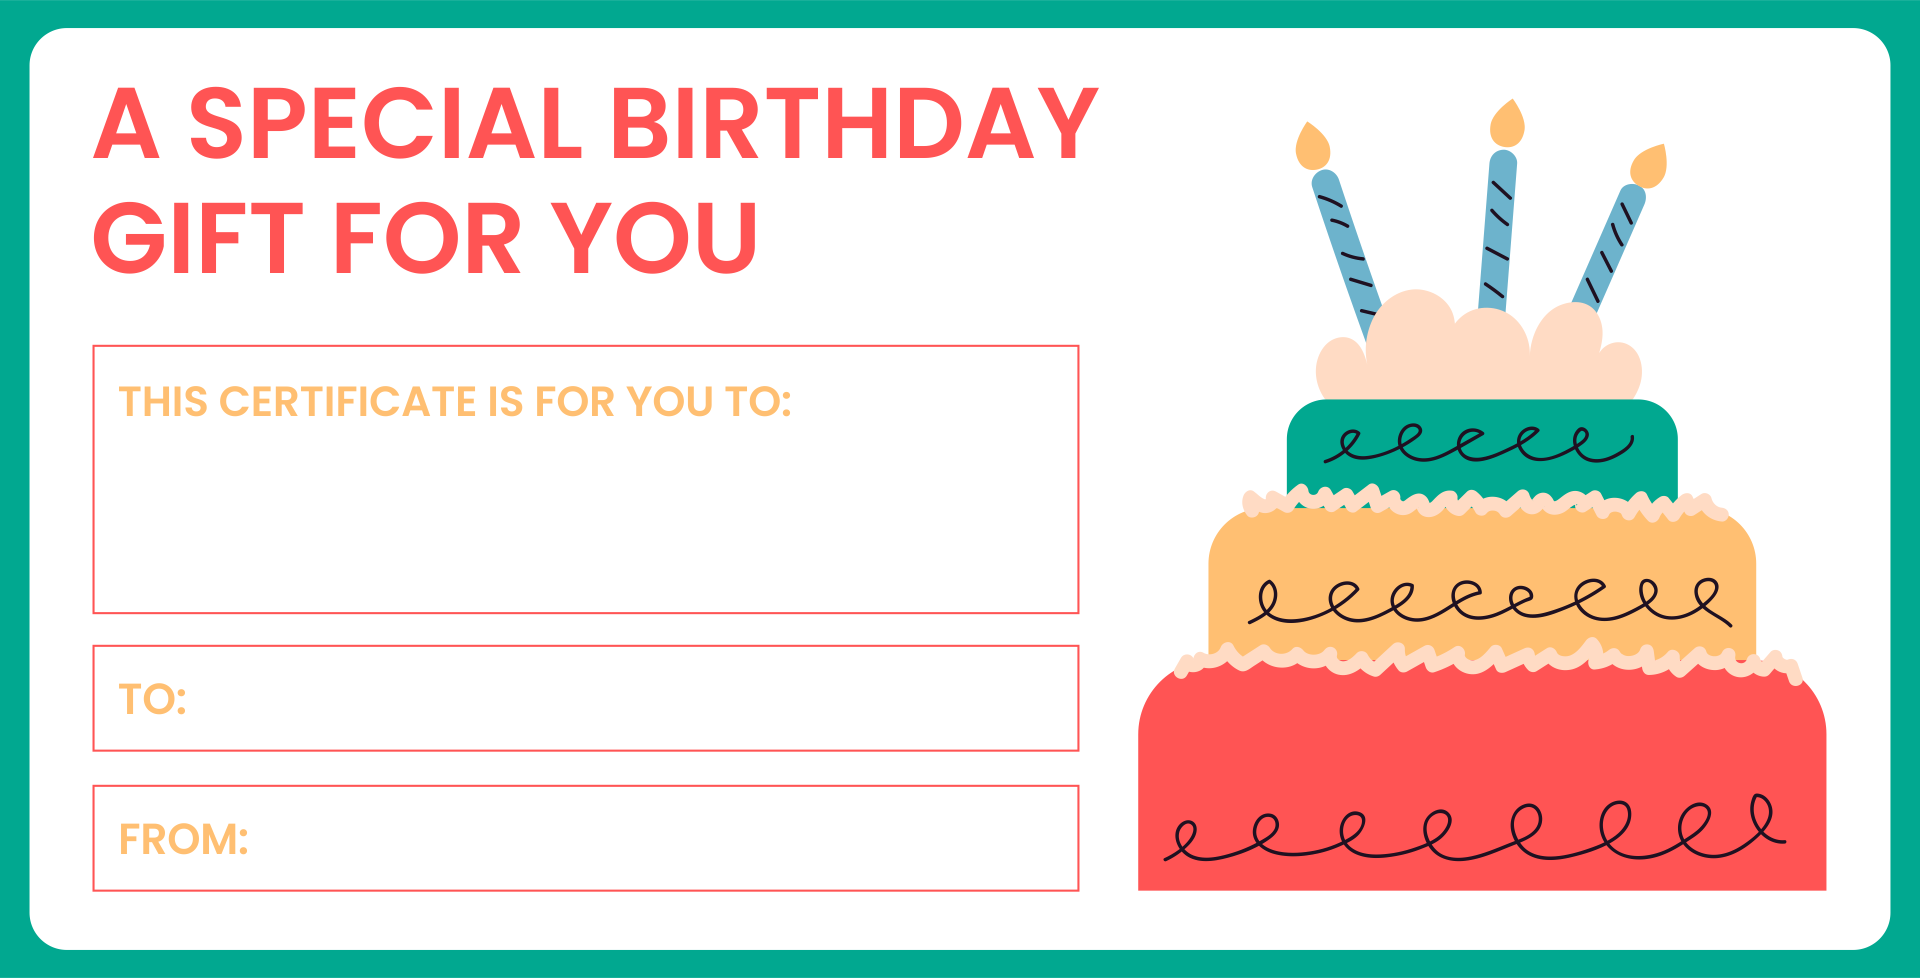 Birthday Certificate Gift Voucher Template Free